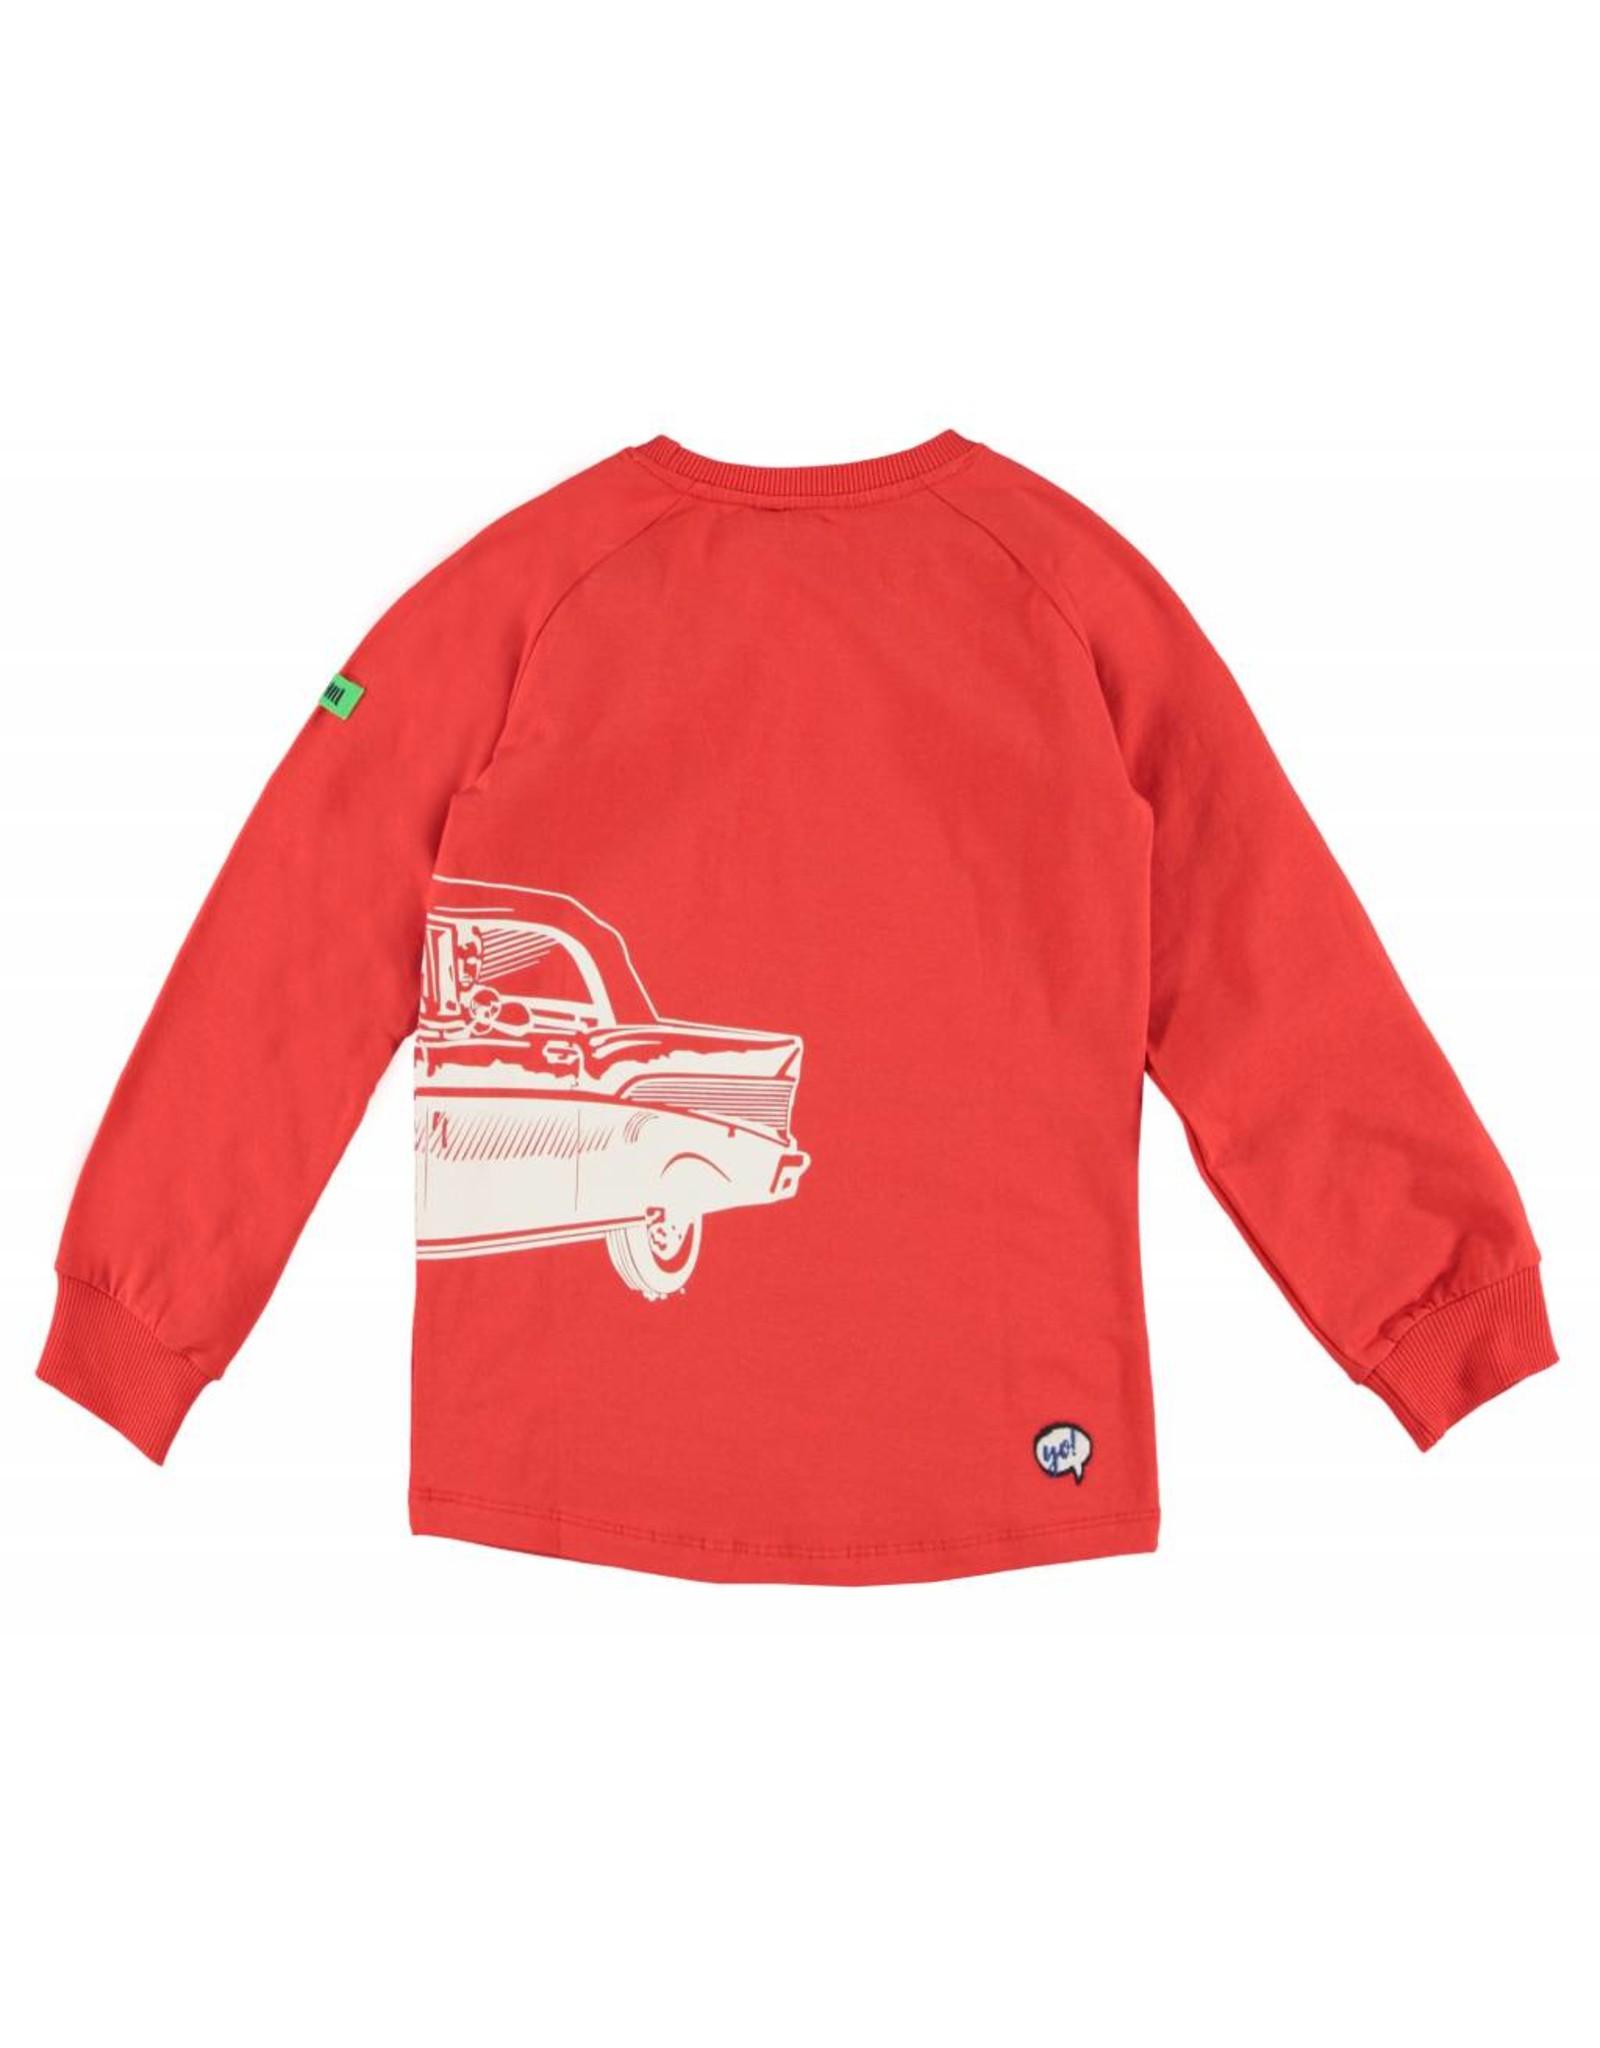 B'Chill B'Chill shirt met auto